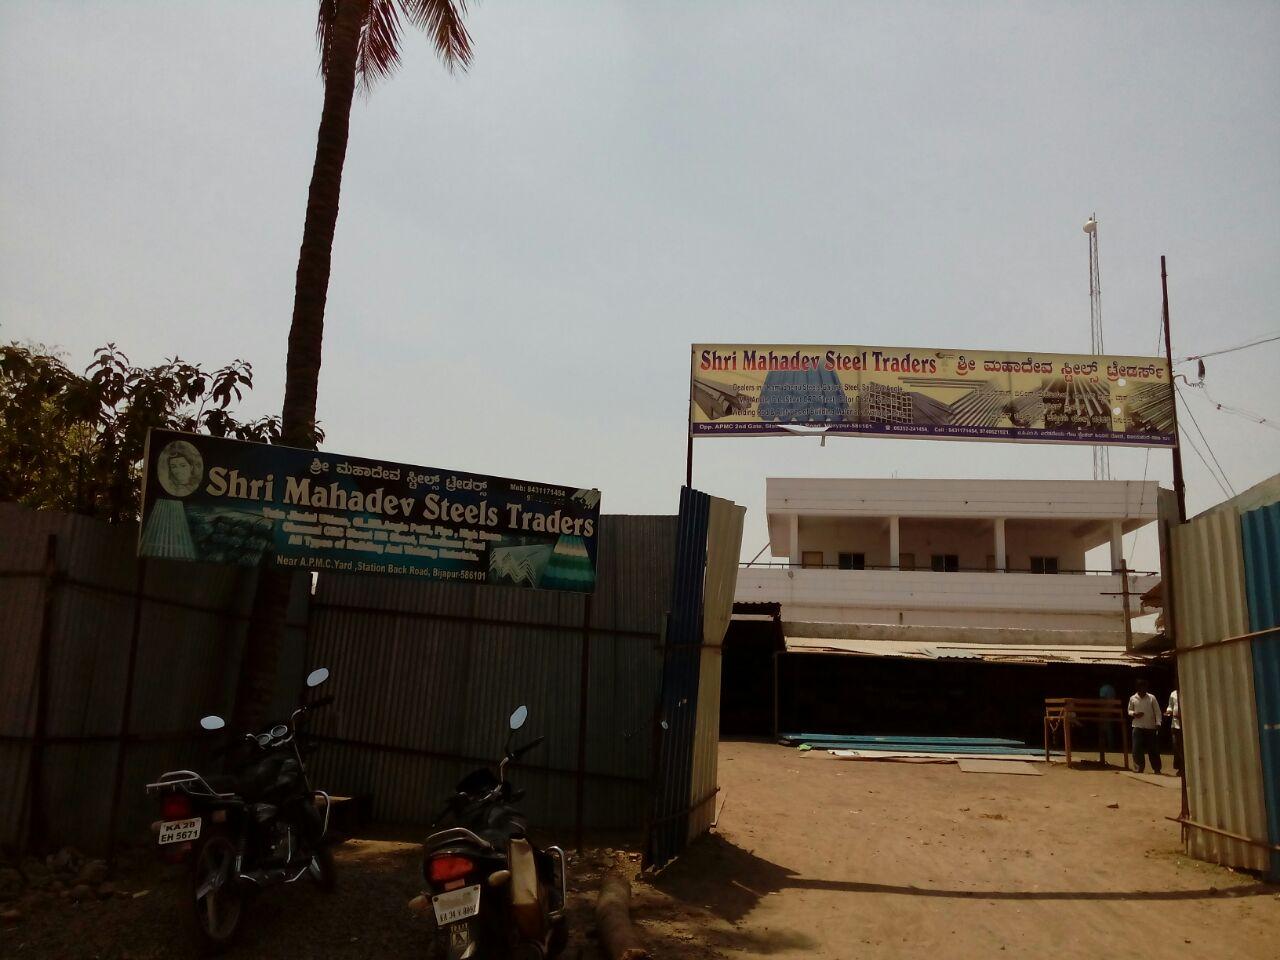 Shri Mahadev Steel Traders